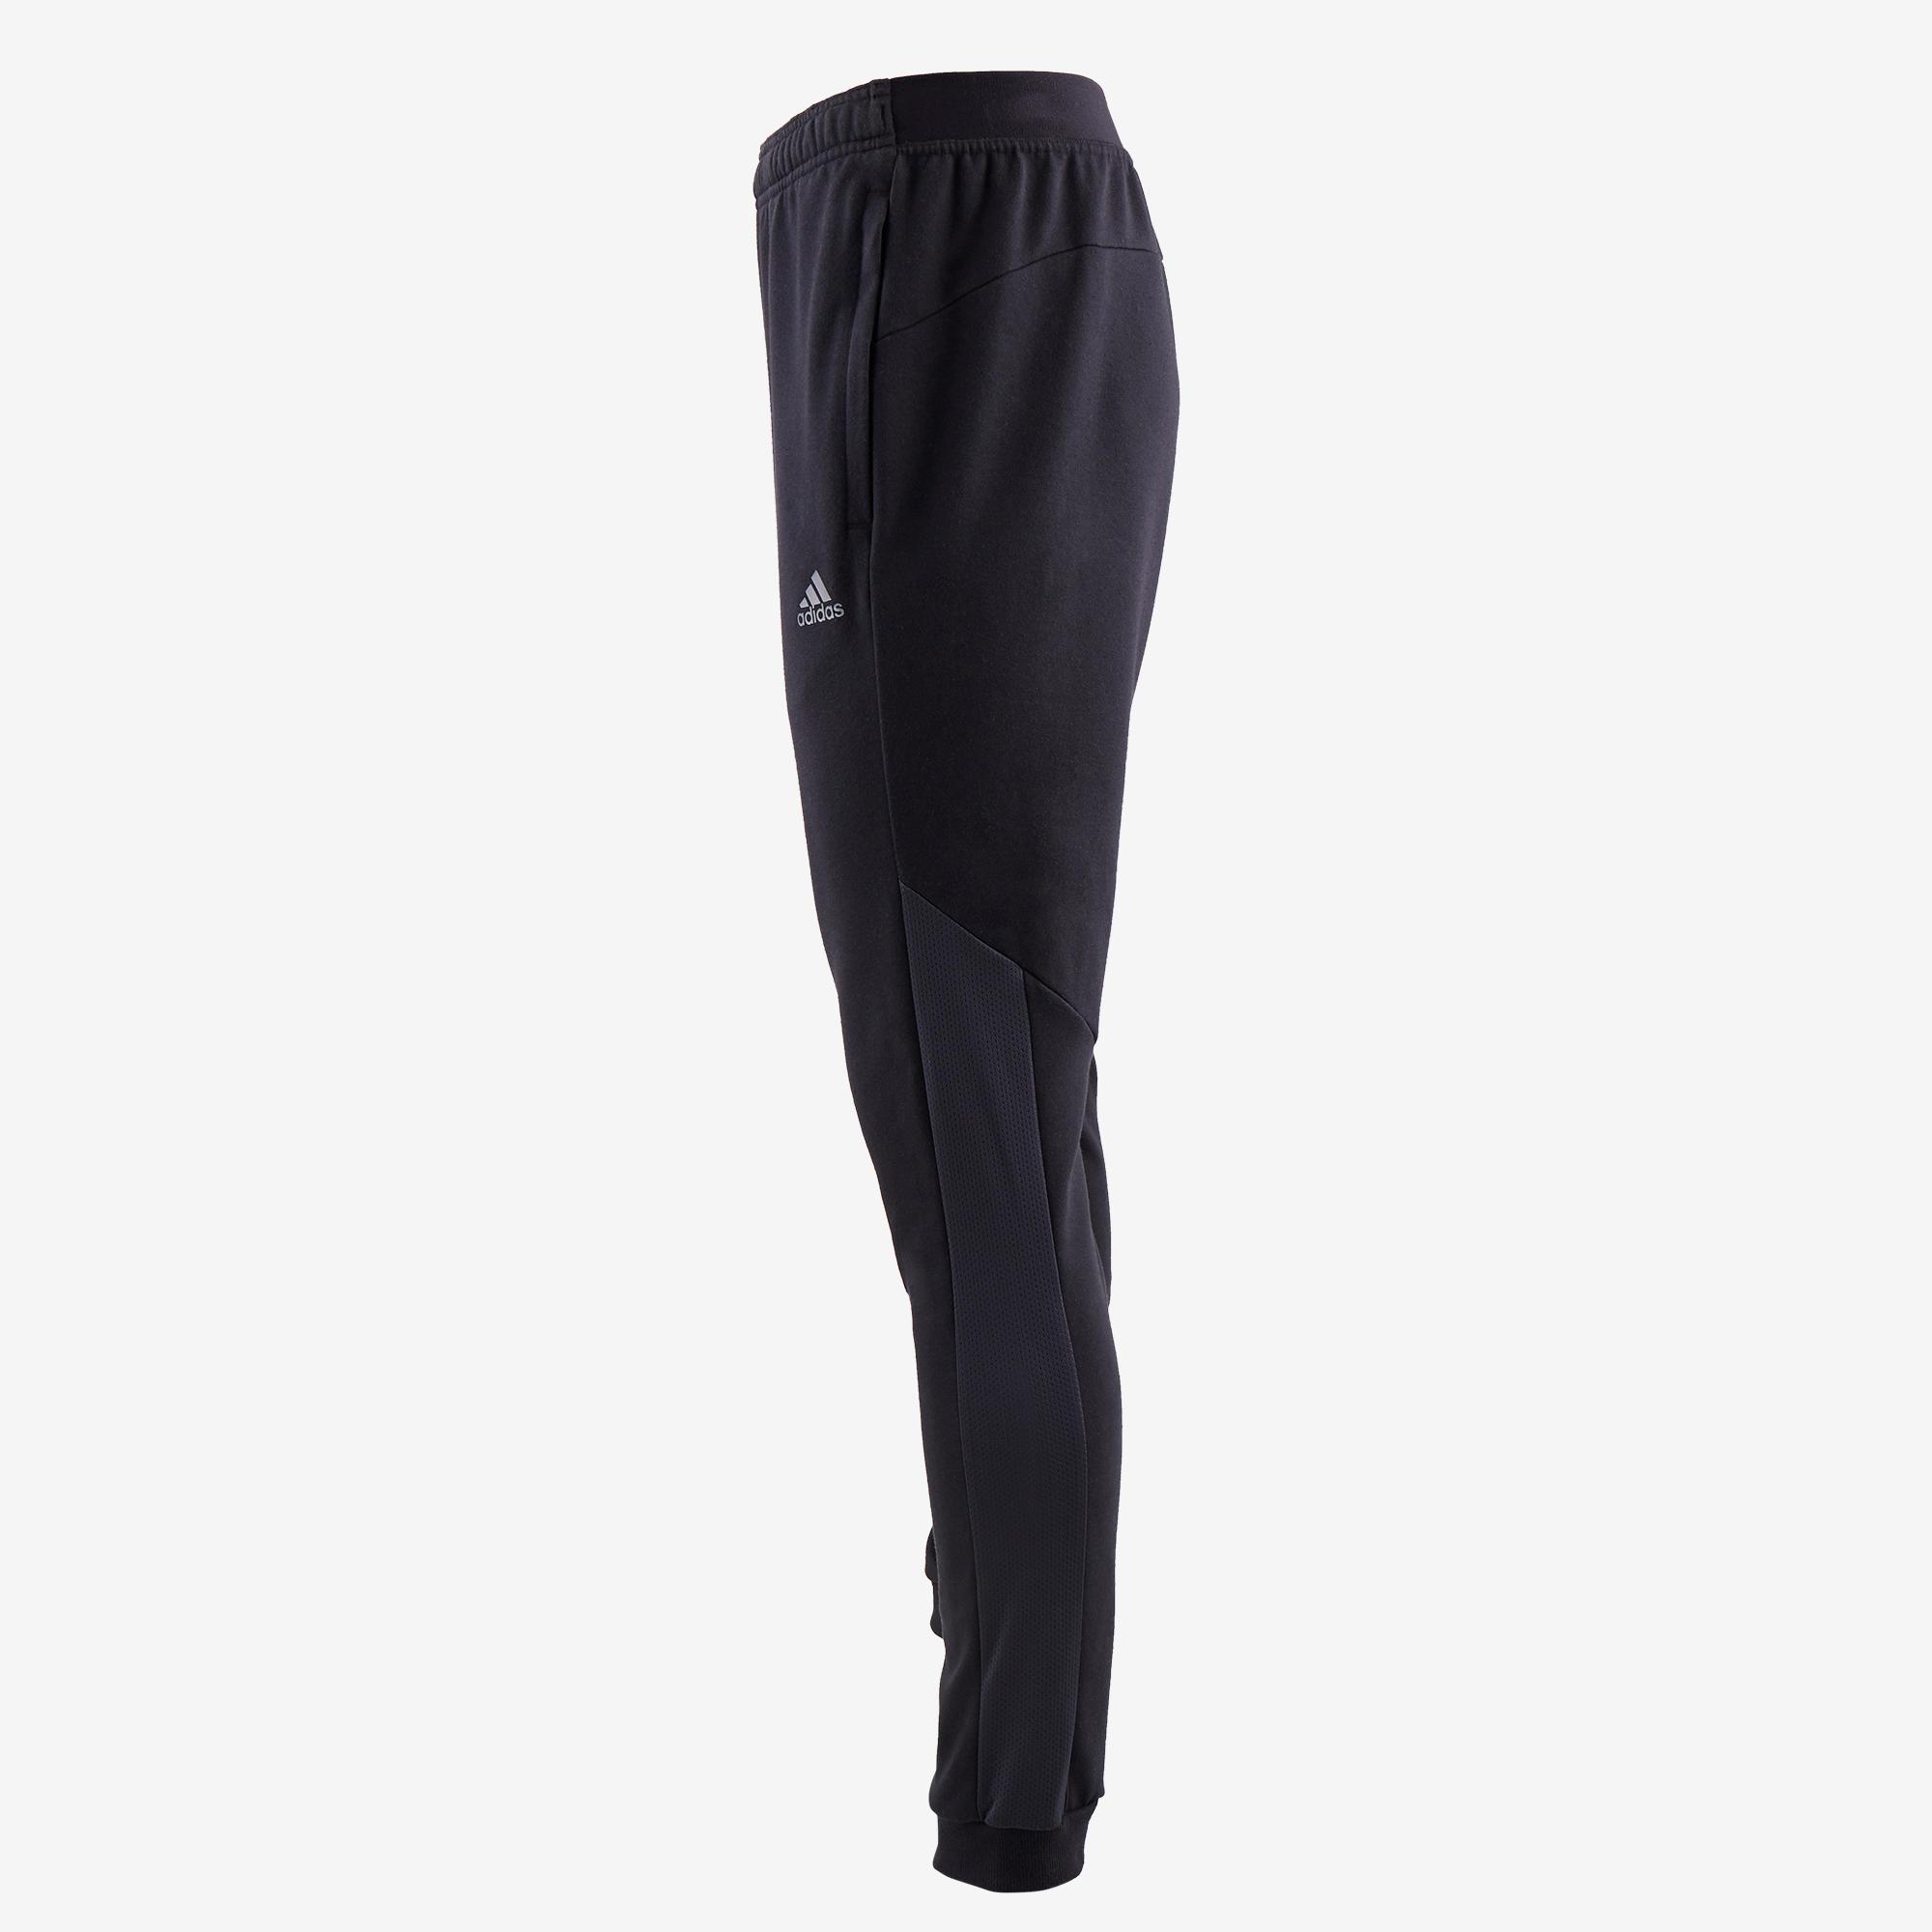 pantalon adidas homme slim